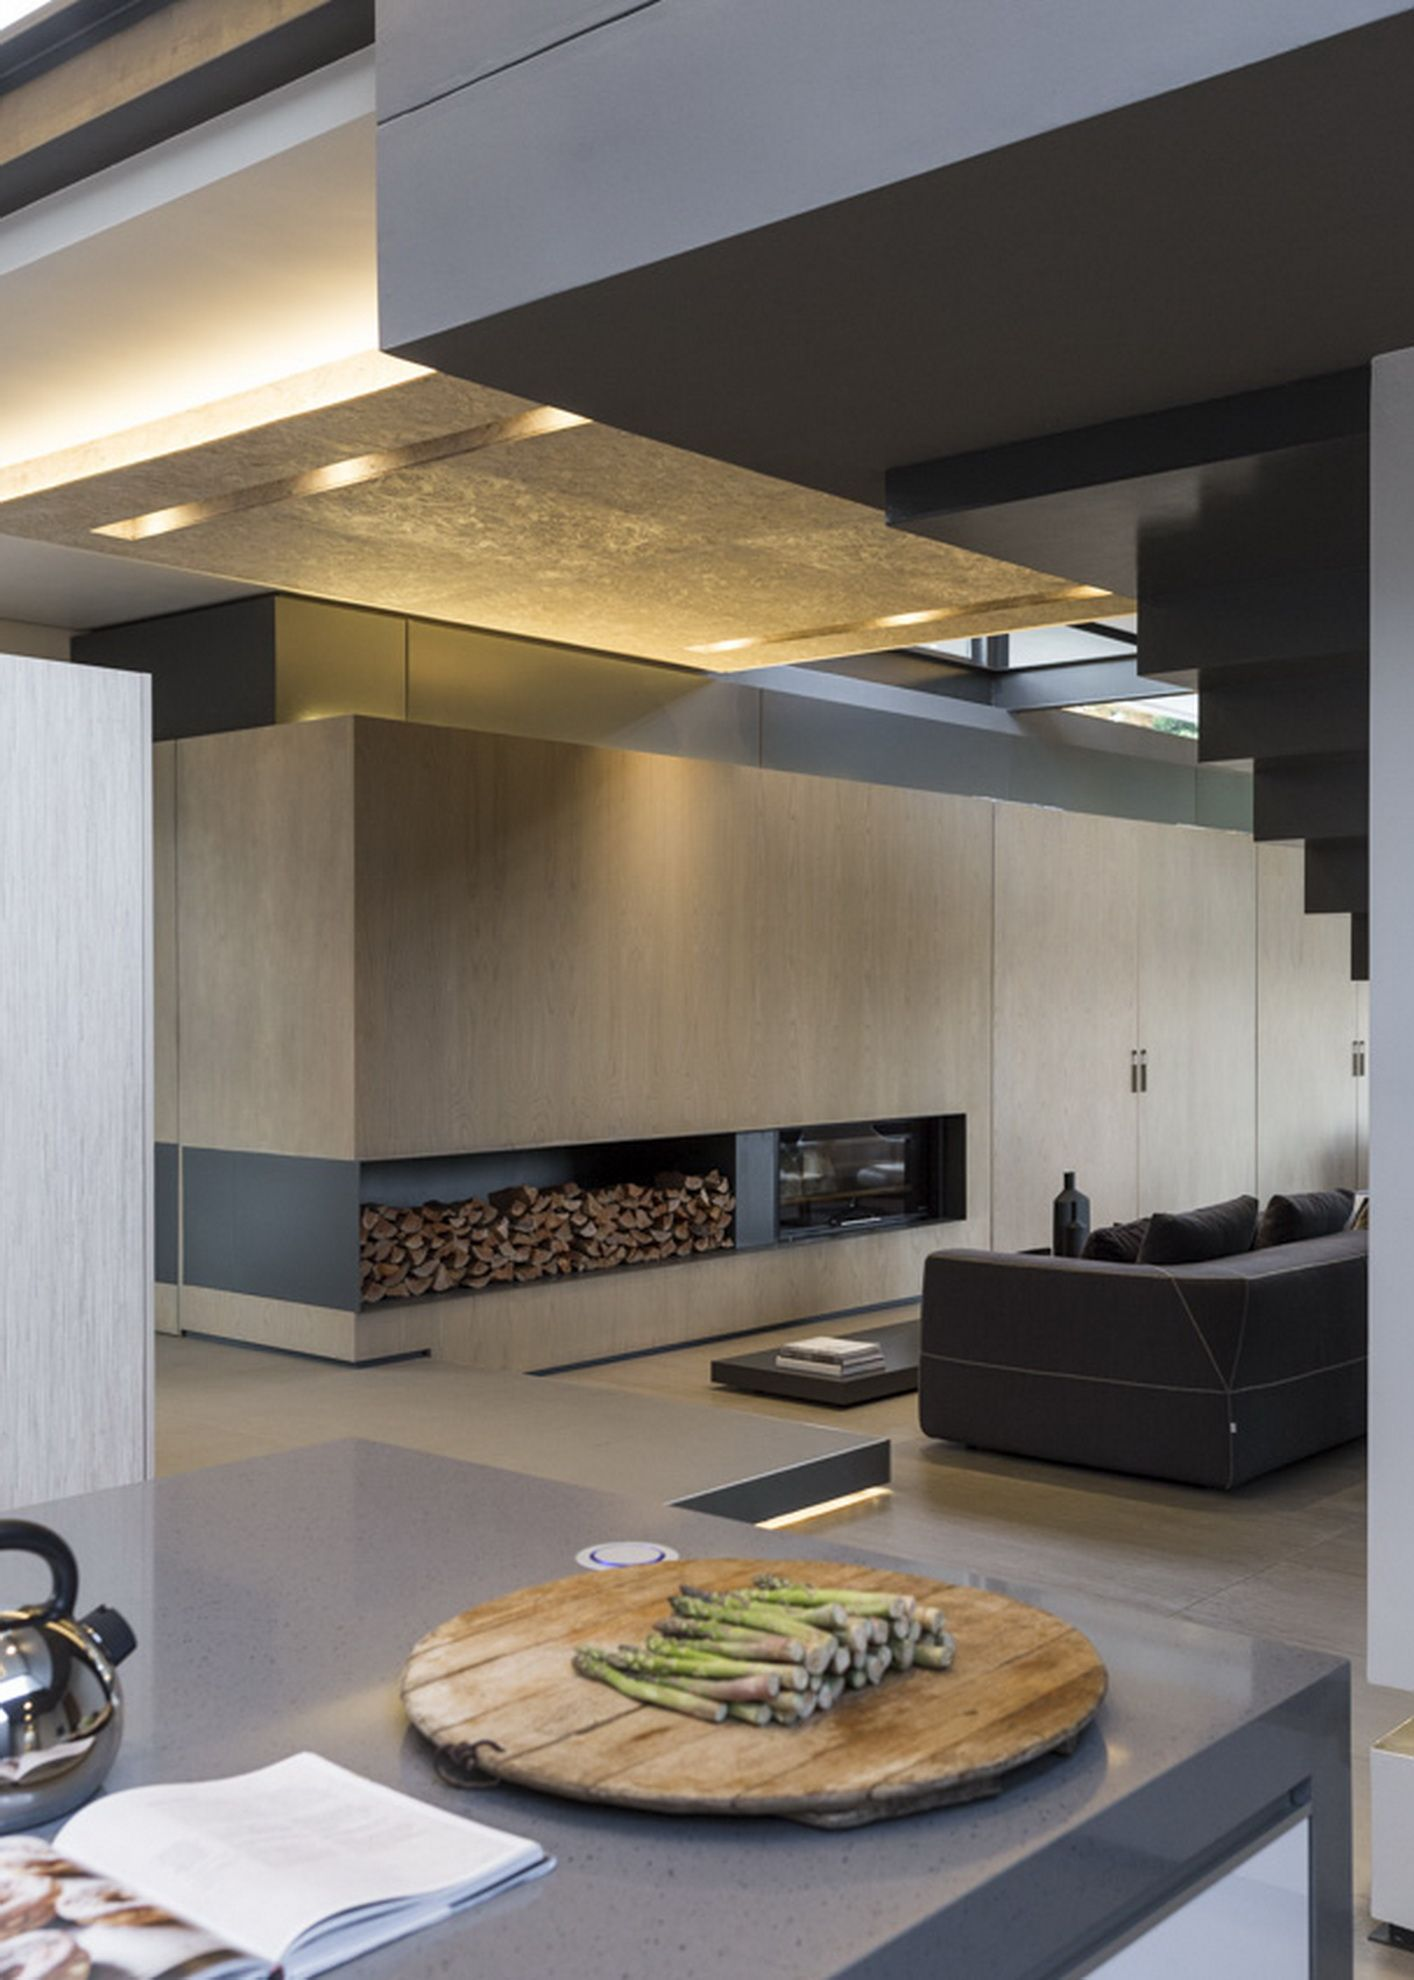 House Sar | Transition Space | M Square Lifestyle Design | M Square ...